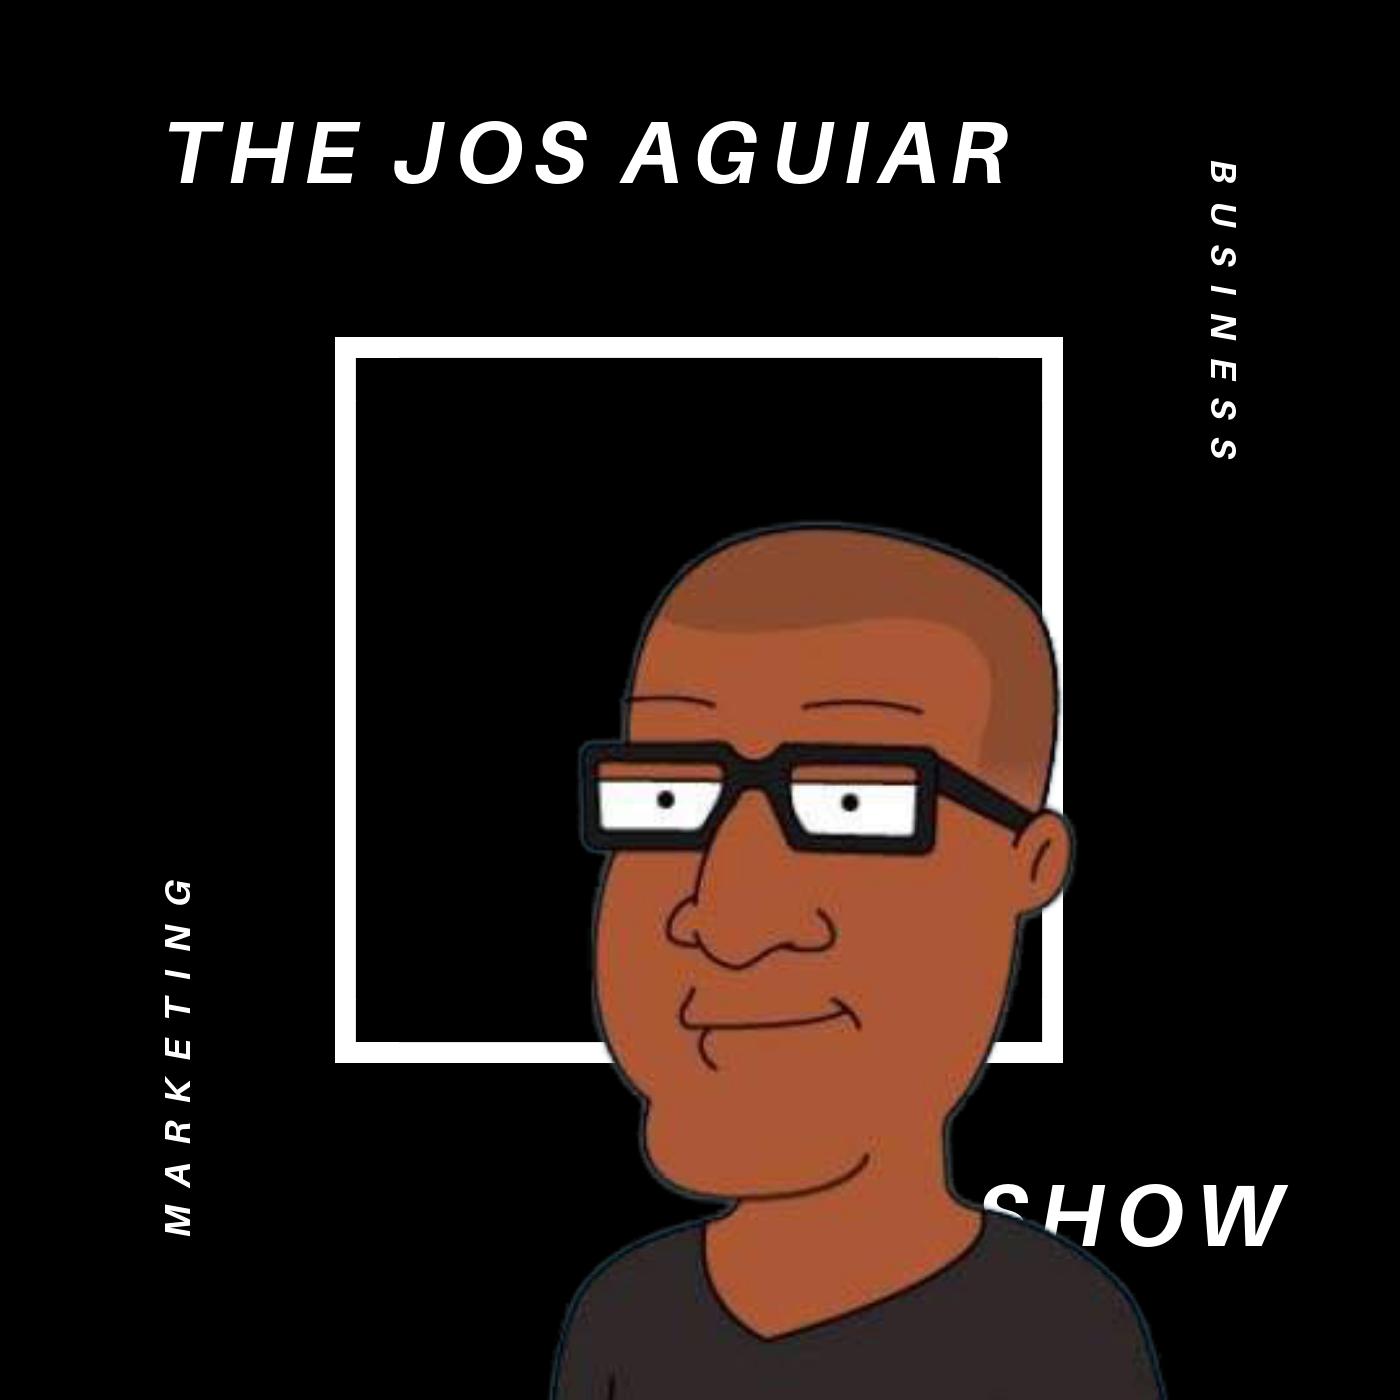 The Jos Aguiar Show